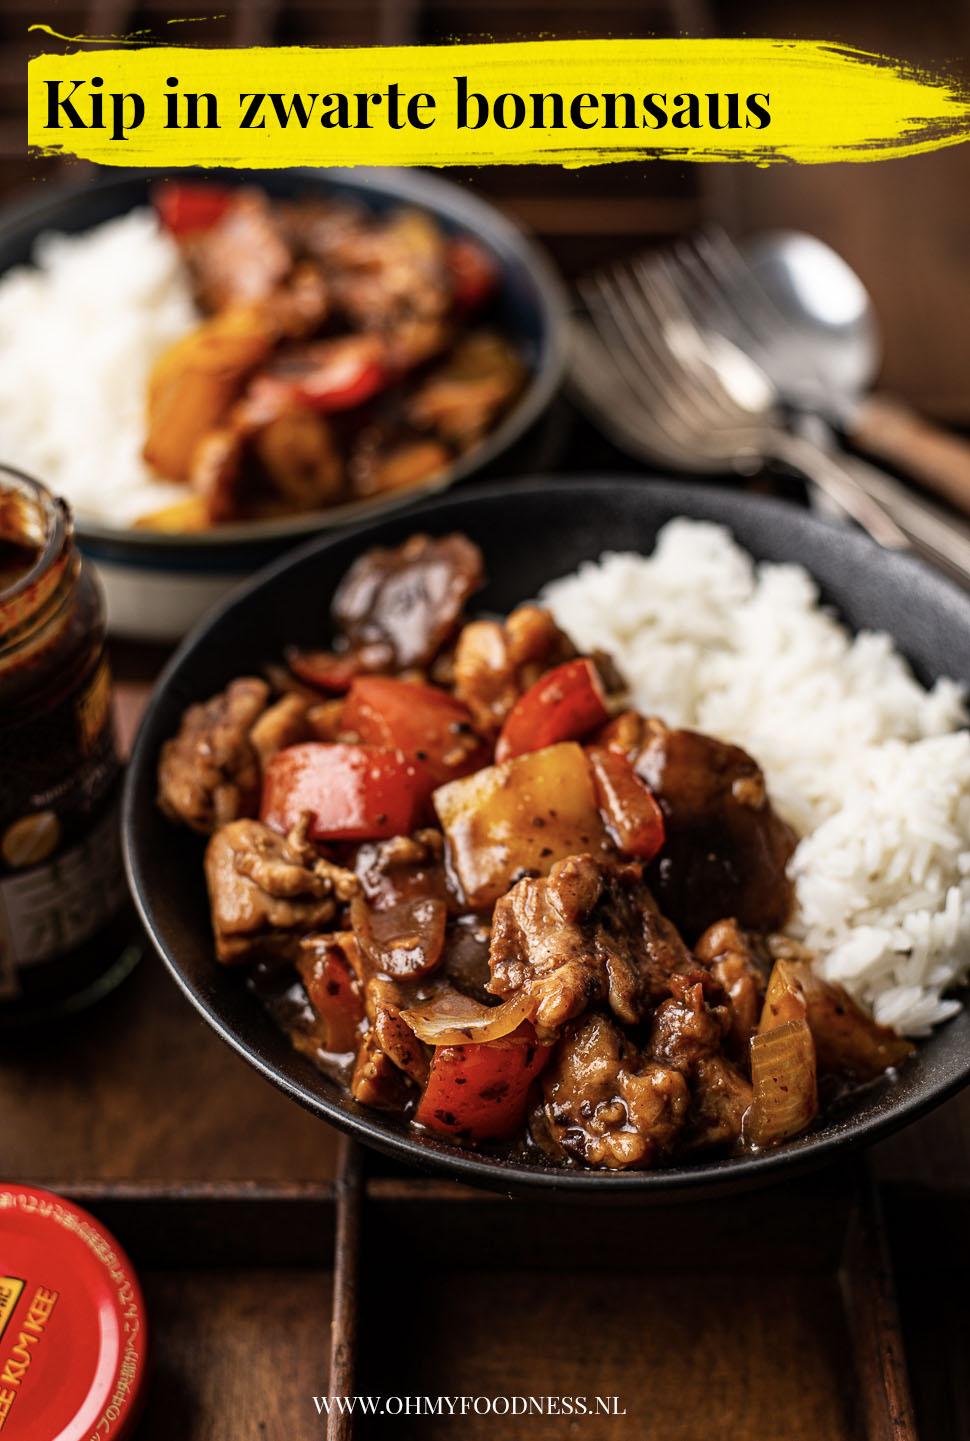 kip in zwarte bonensaus